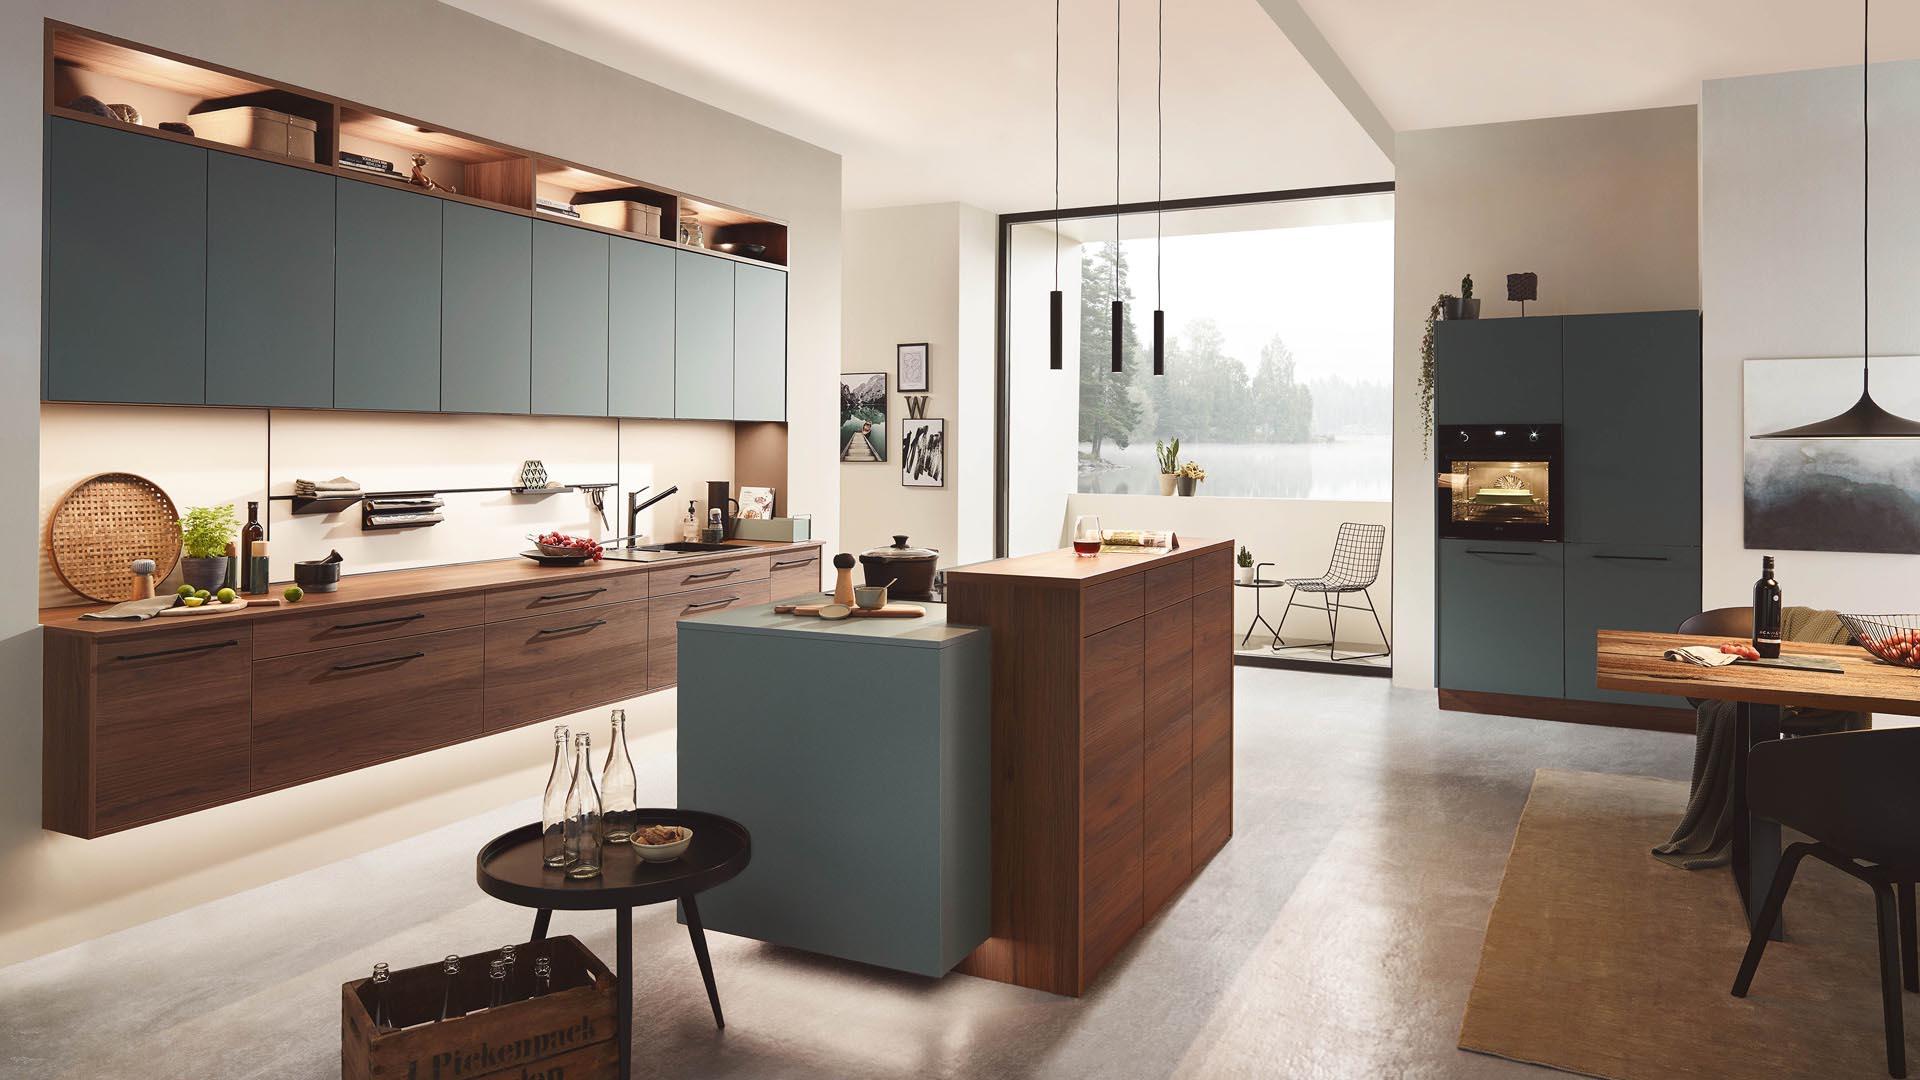 Bild: Küche FIORA / EDDA